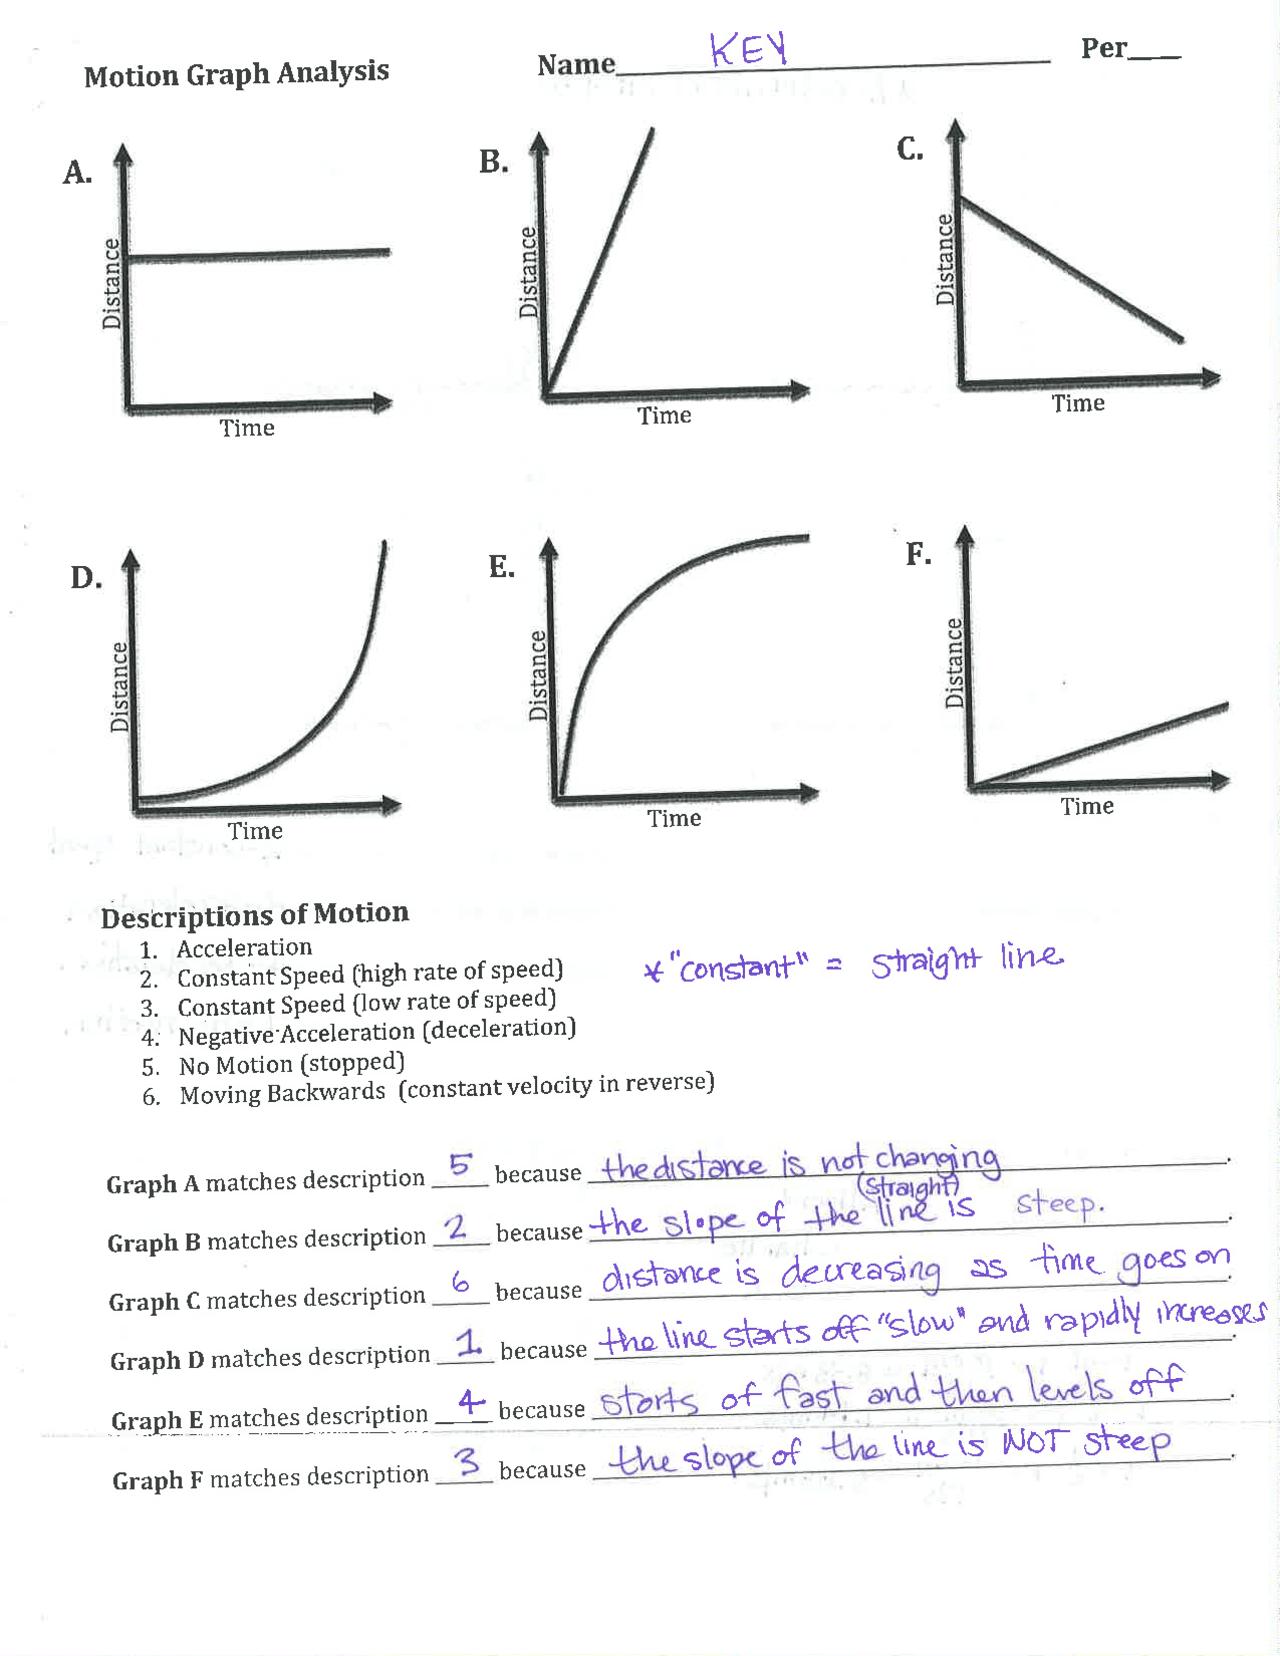 Worksheet on Motion Graph Analysis Answer Key - Docsity Within Motion Graph Analysis Worksheet